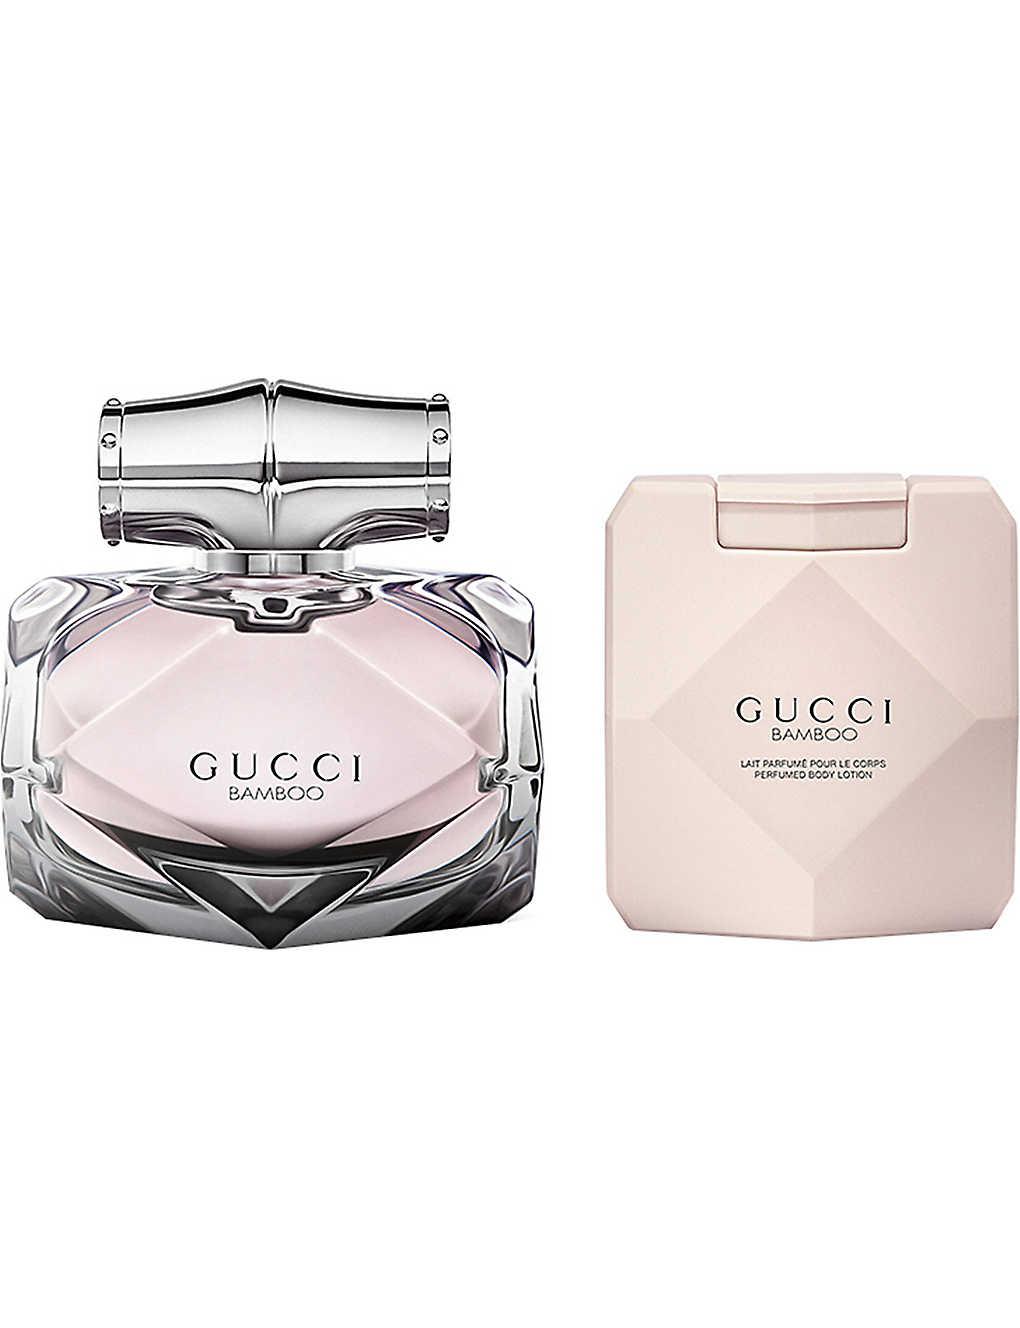 Gucci Bamboo Eau De Parfum Gift Set 75ml Edp Women No Recent Searches